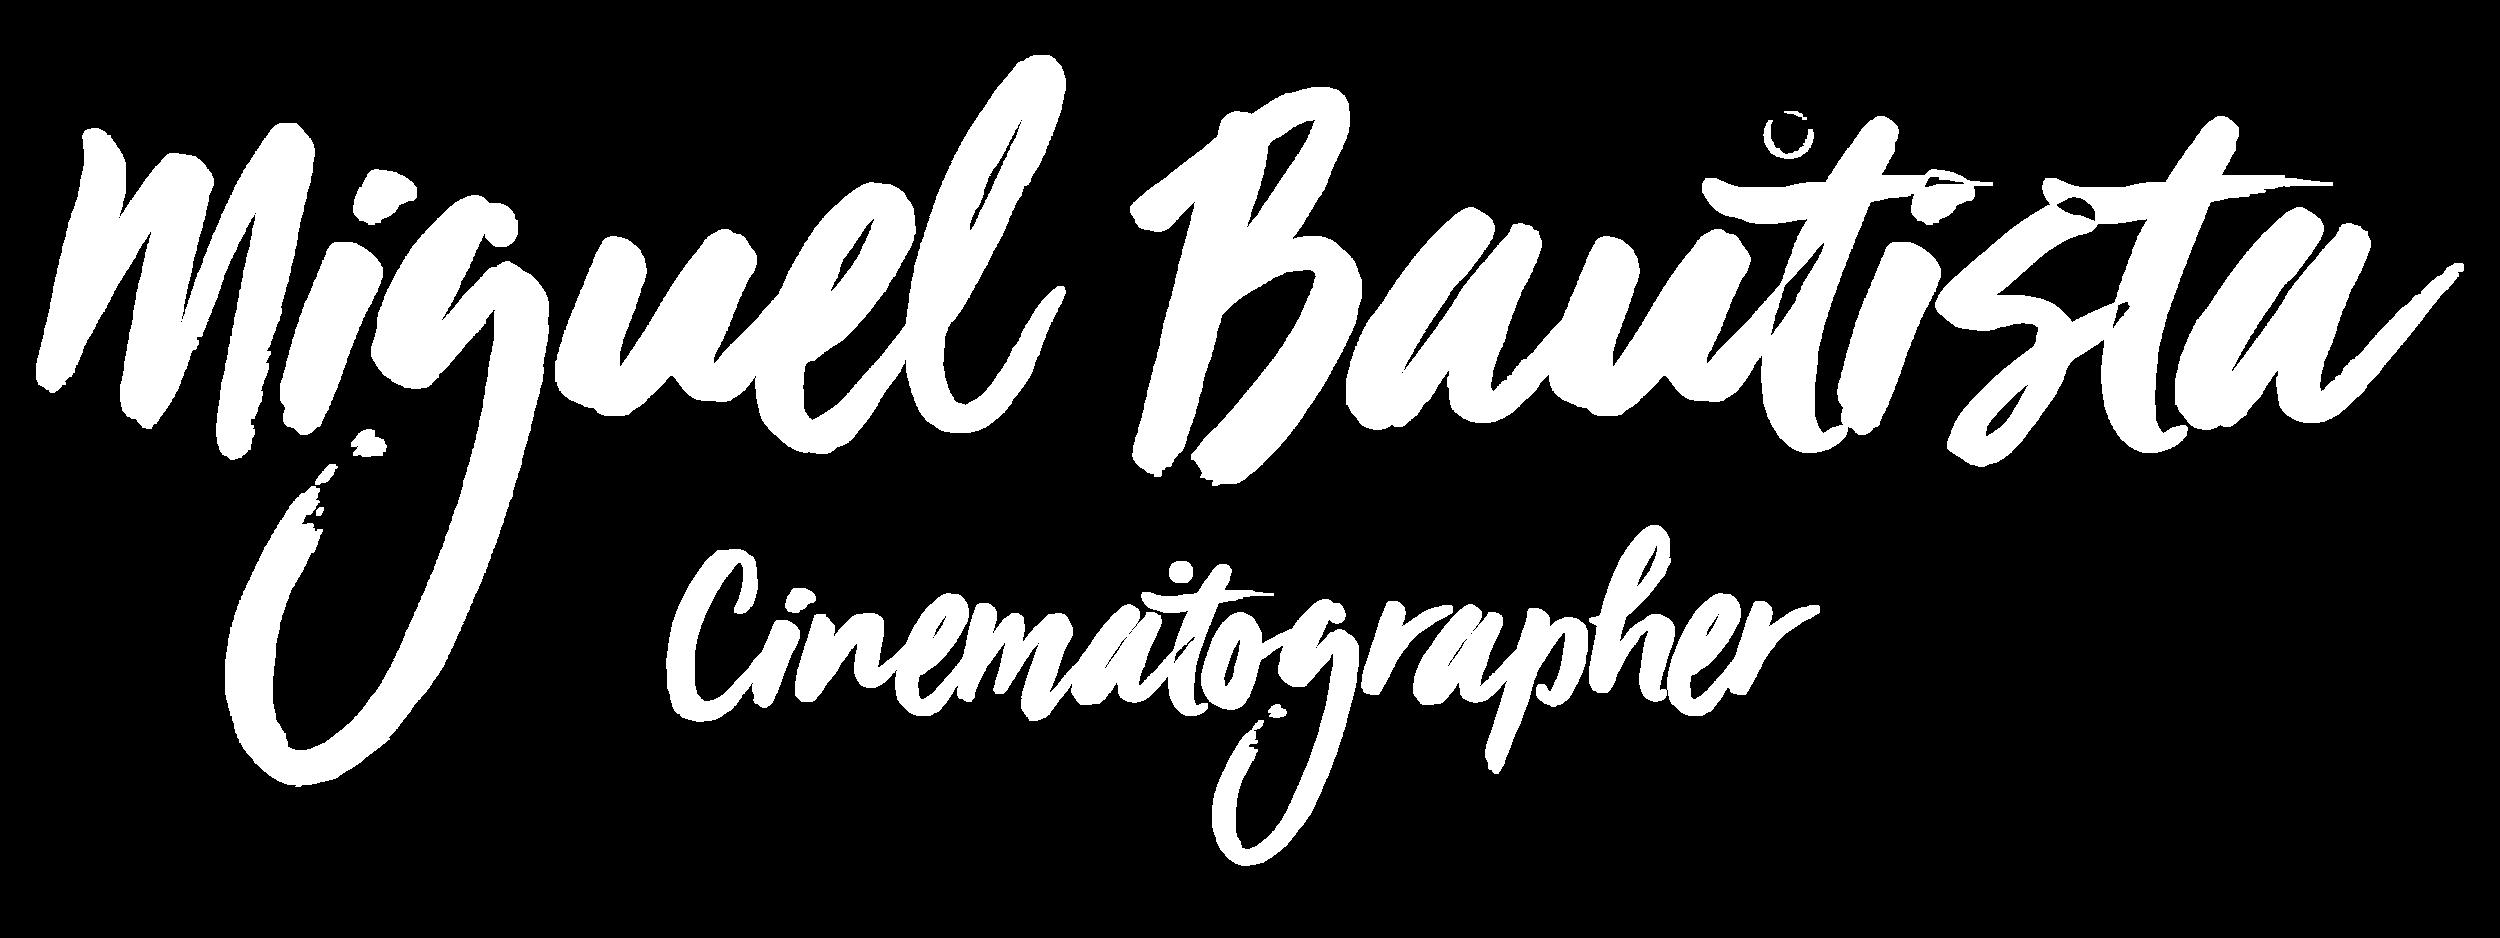 Miguel Bautista cinematographer White 2.png